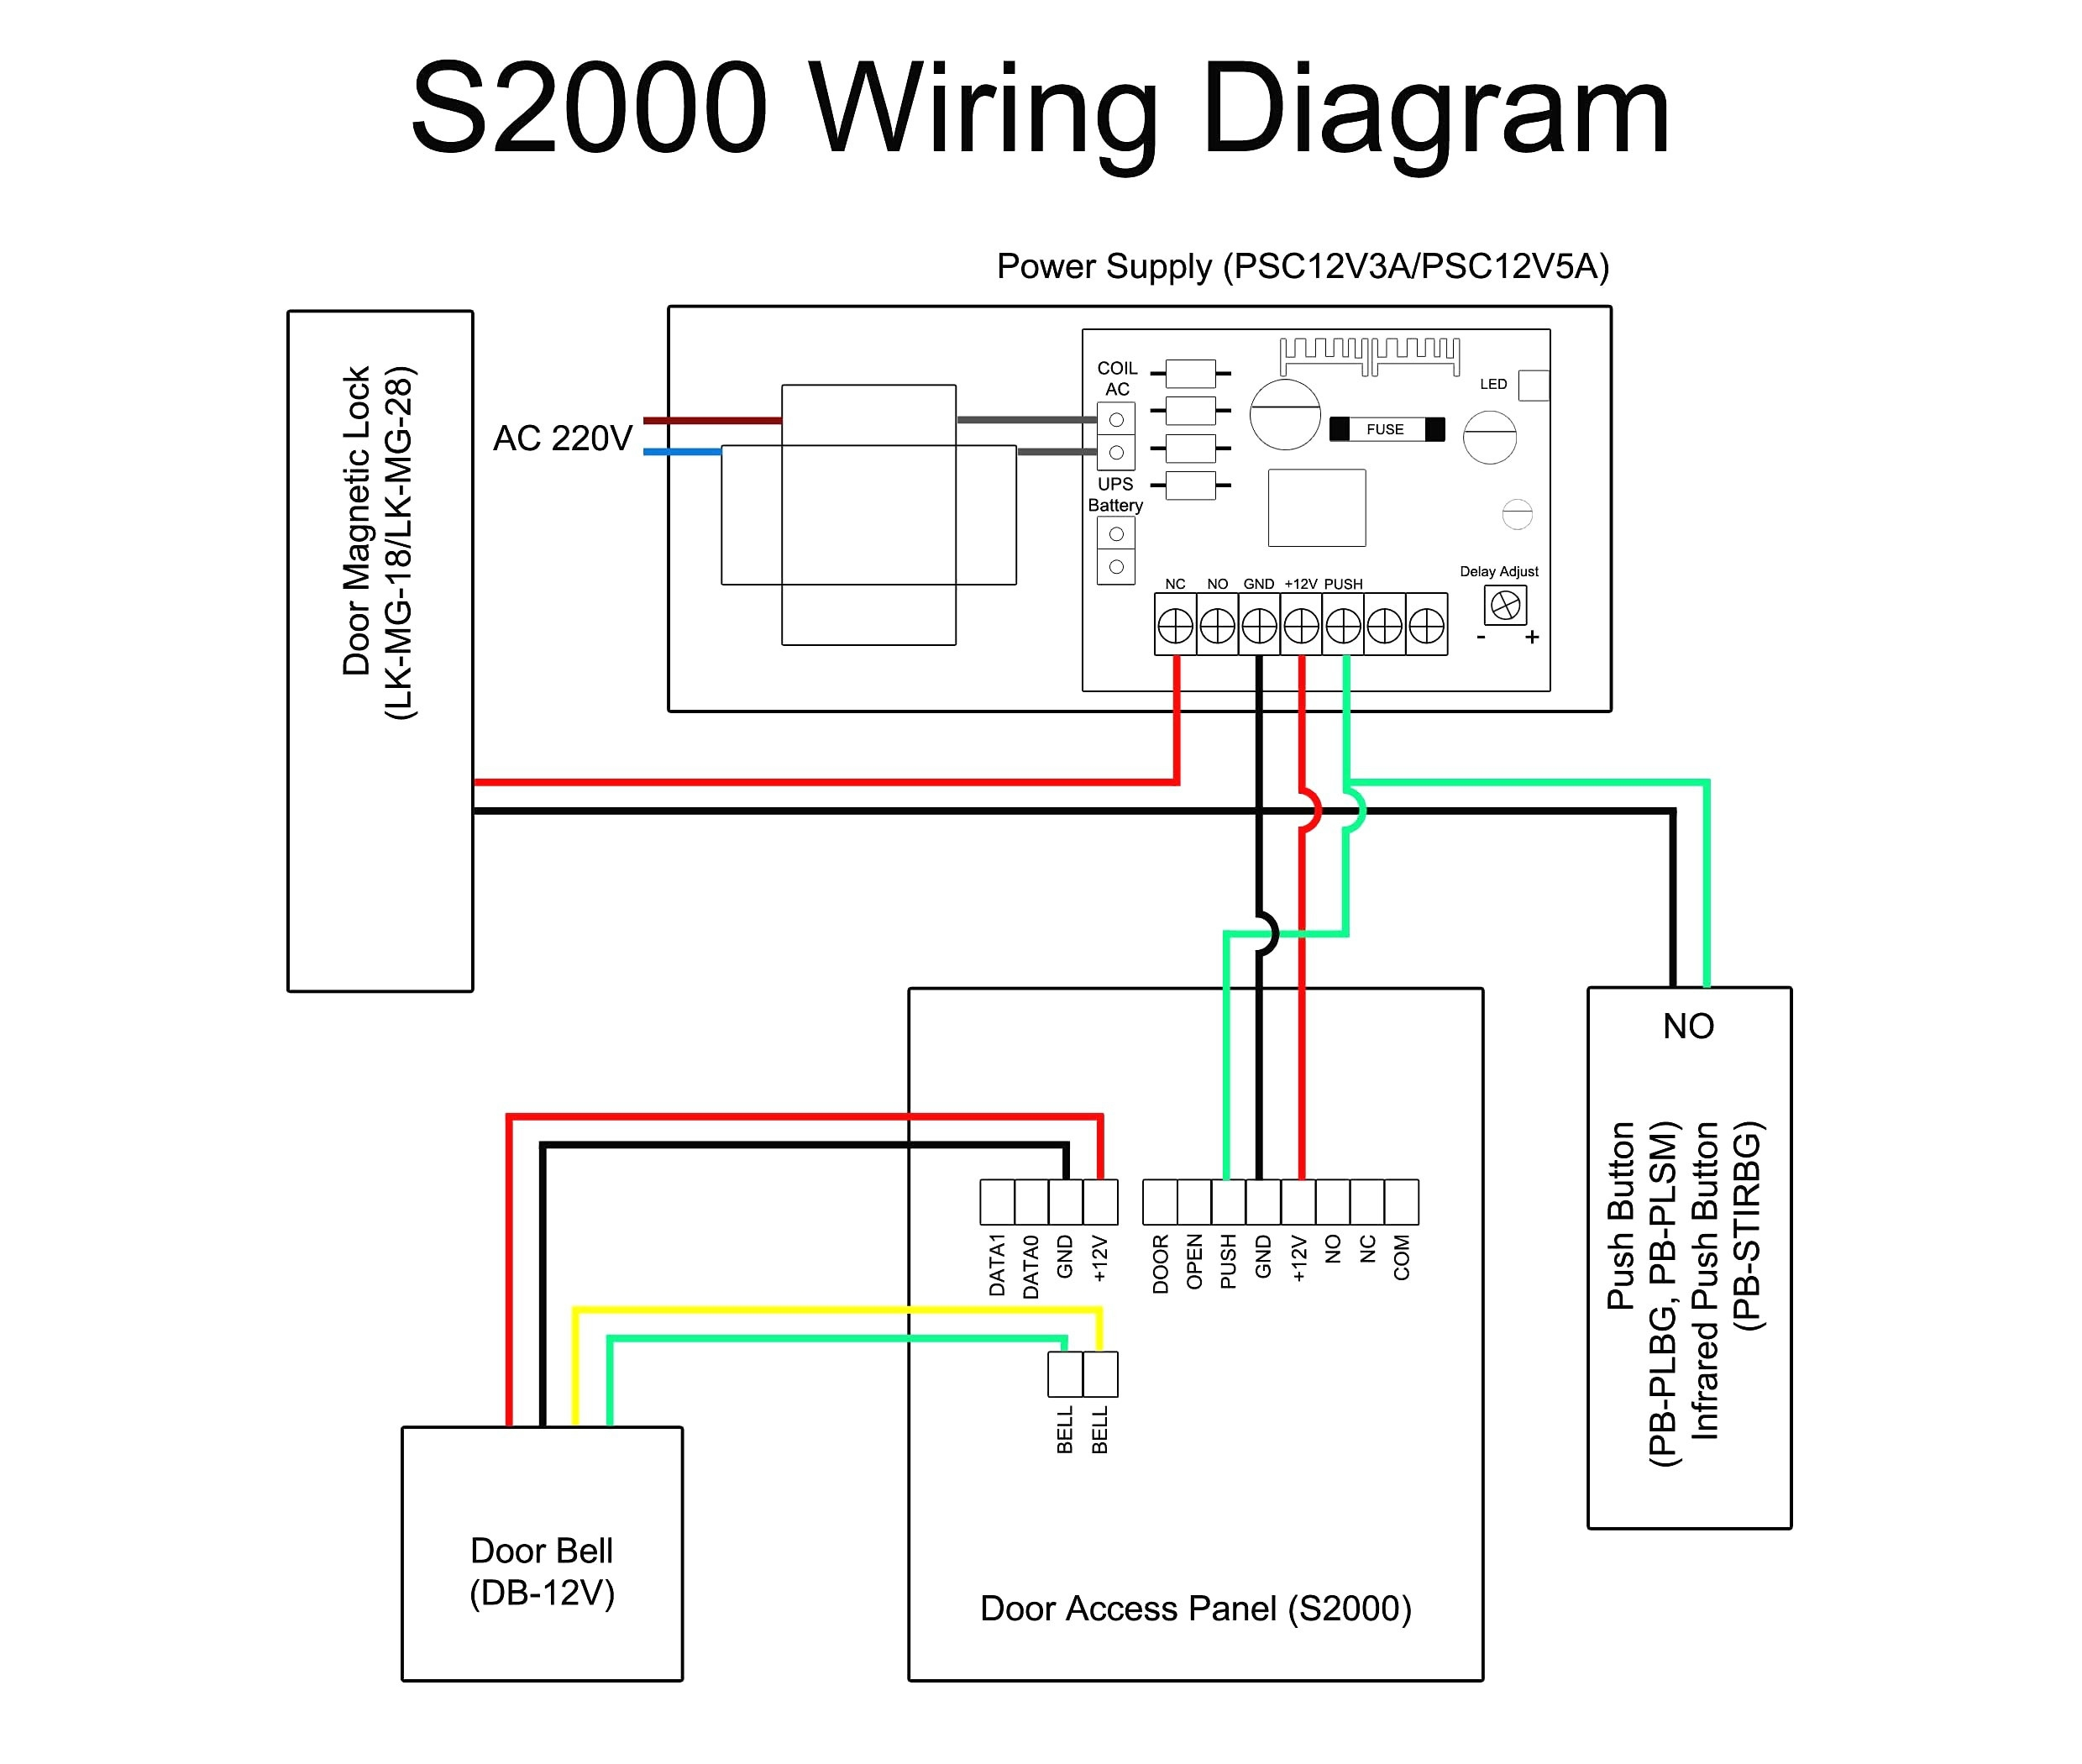 Nvr Ip Camera Wiring Diagram Manual Guide